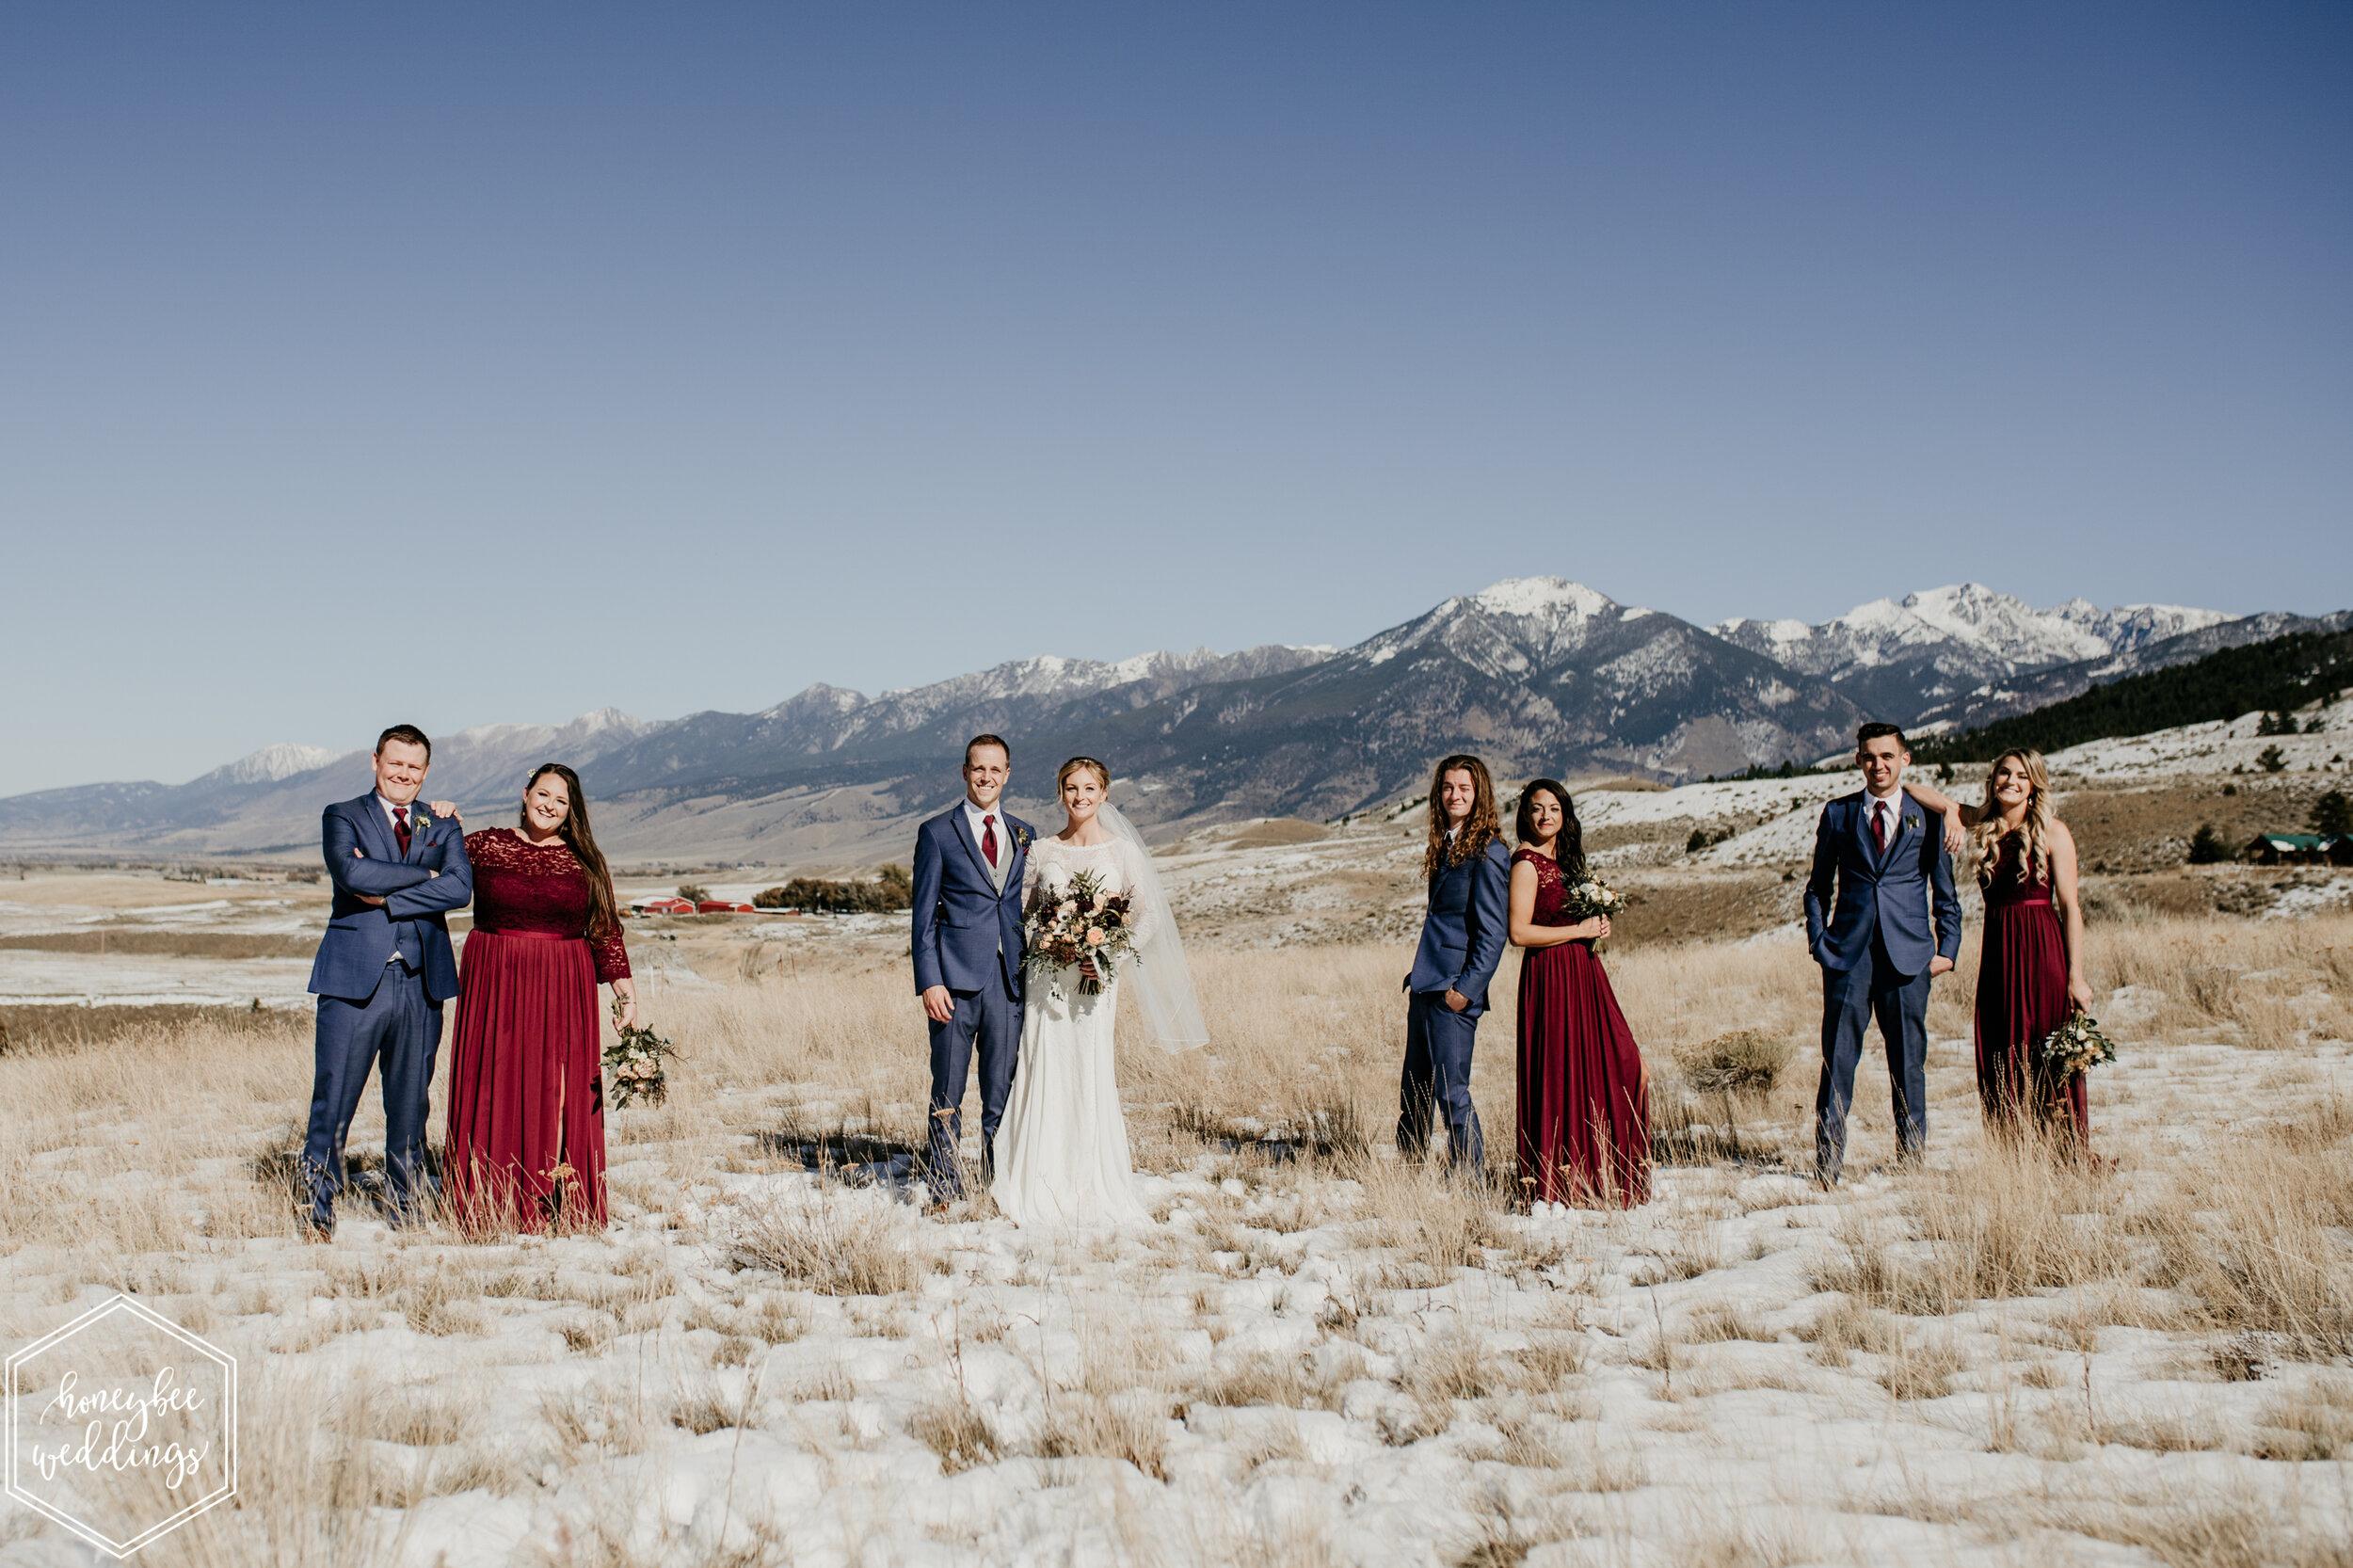 104Chico Hot Springs Wedding_Montana Wedding Photographer_Winter Wedding_Ariel & Richard_October 12, 2019-1329.jpg